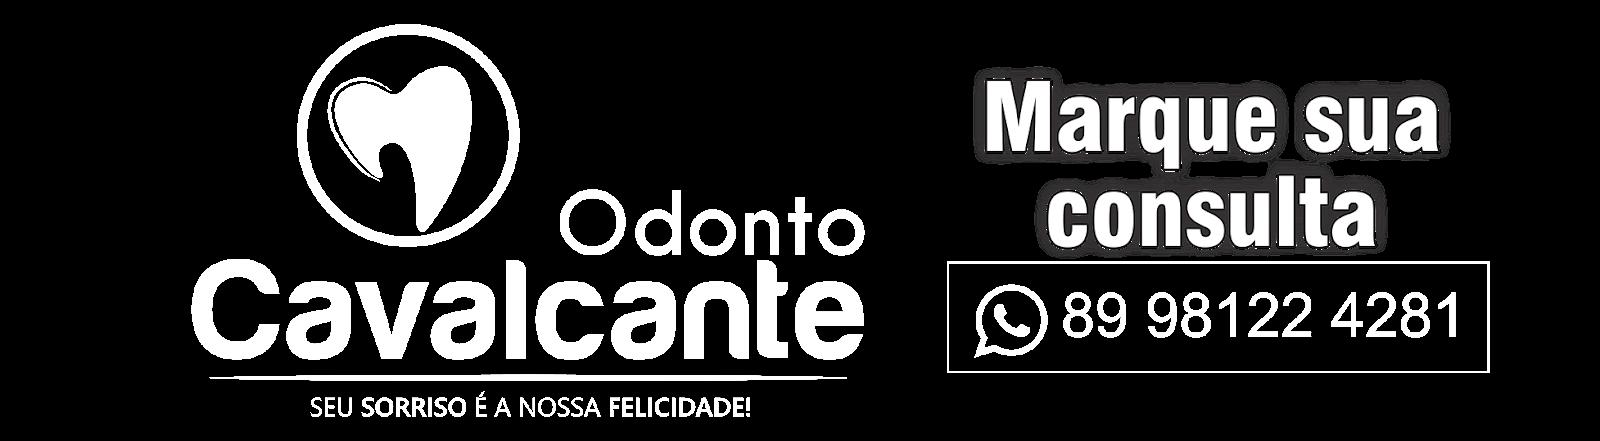 Odonto Cavalcante